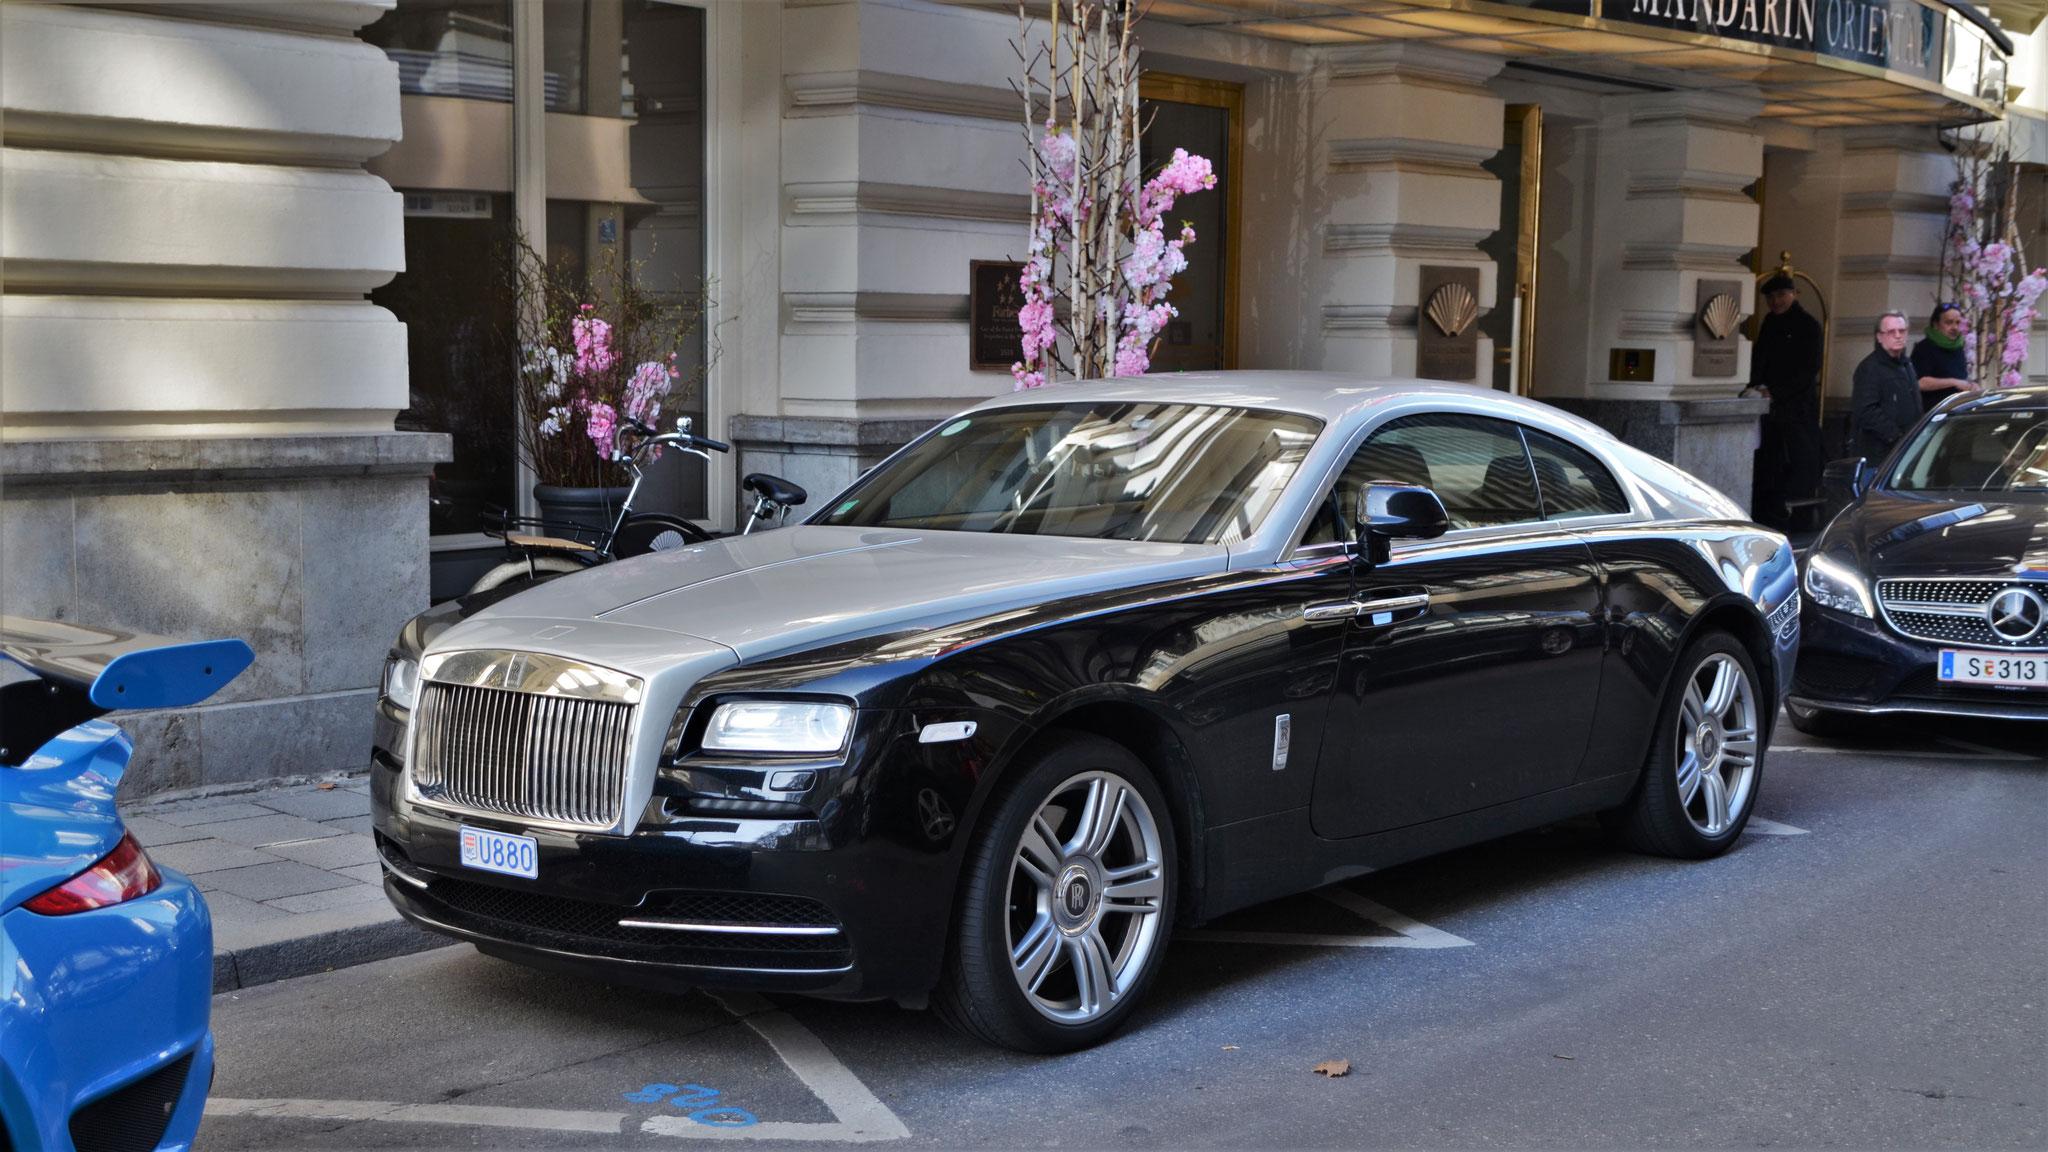 Rolls Royce Wraith - U880 (MC)